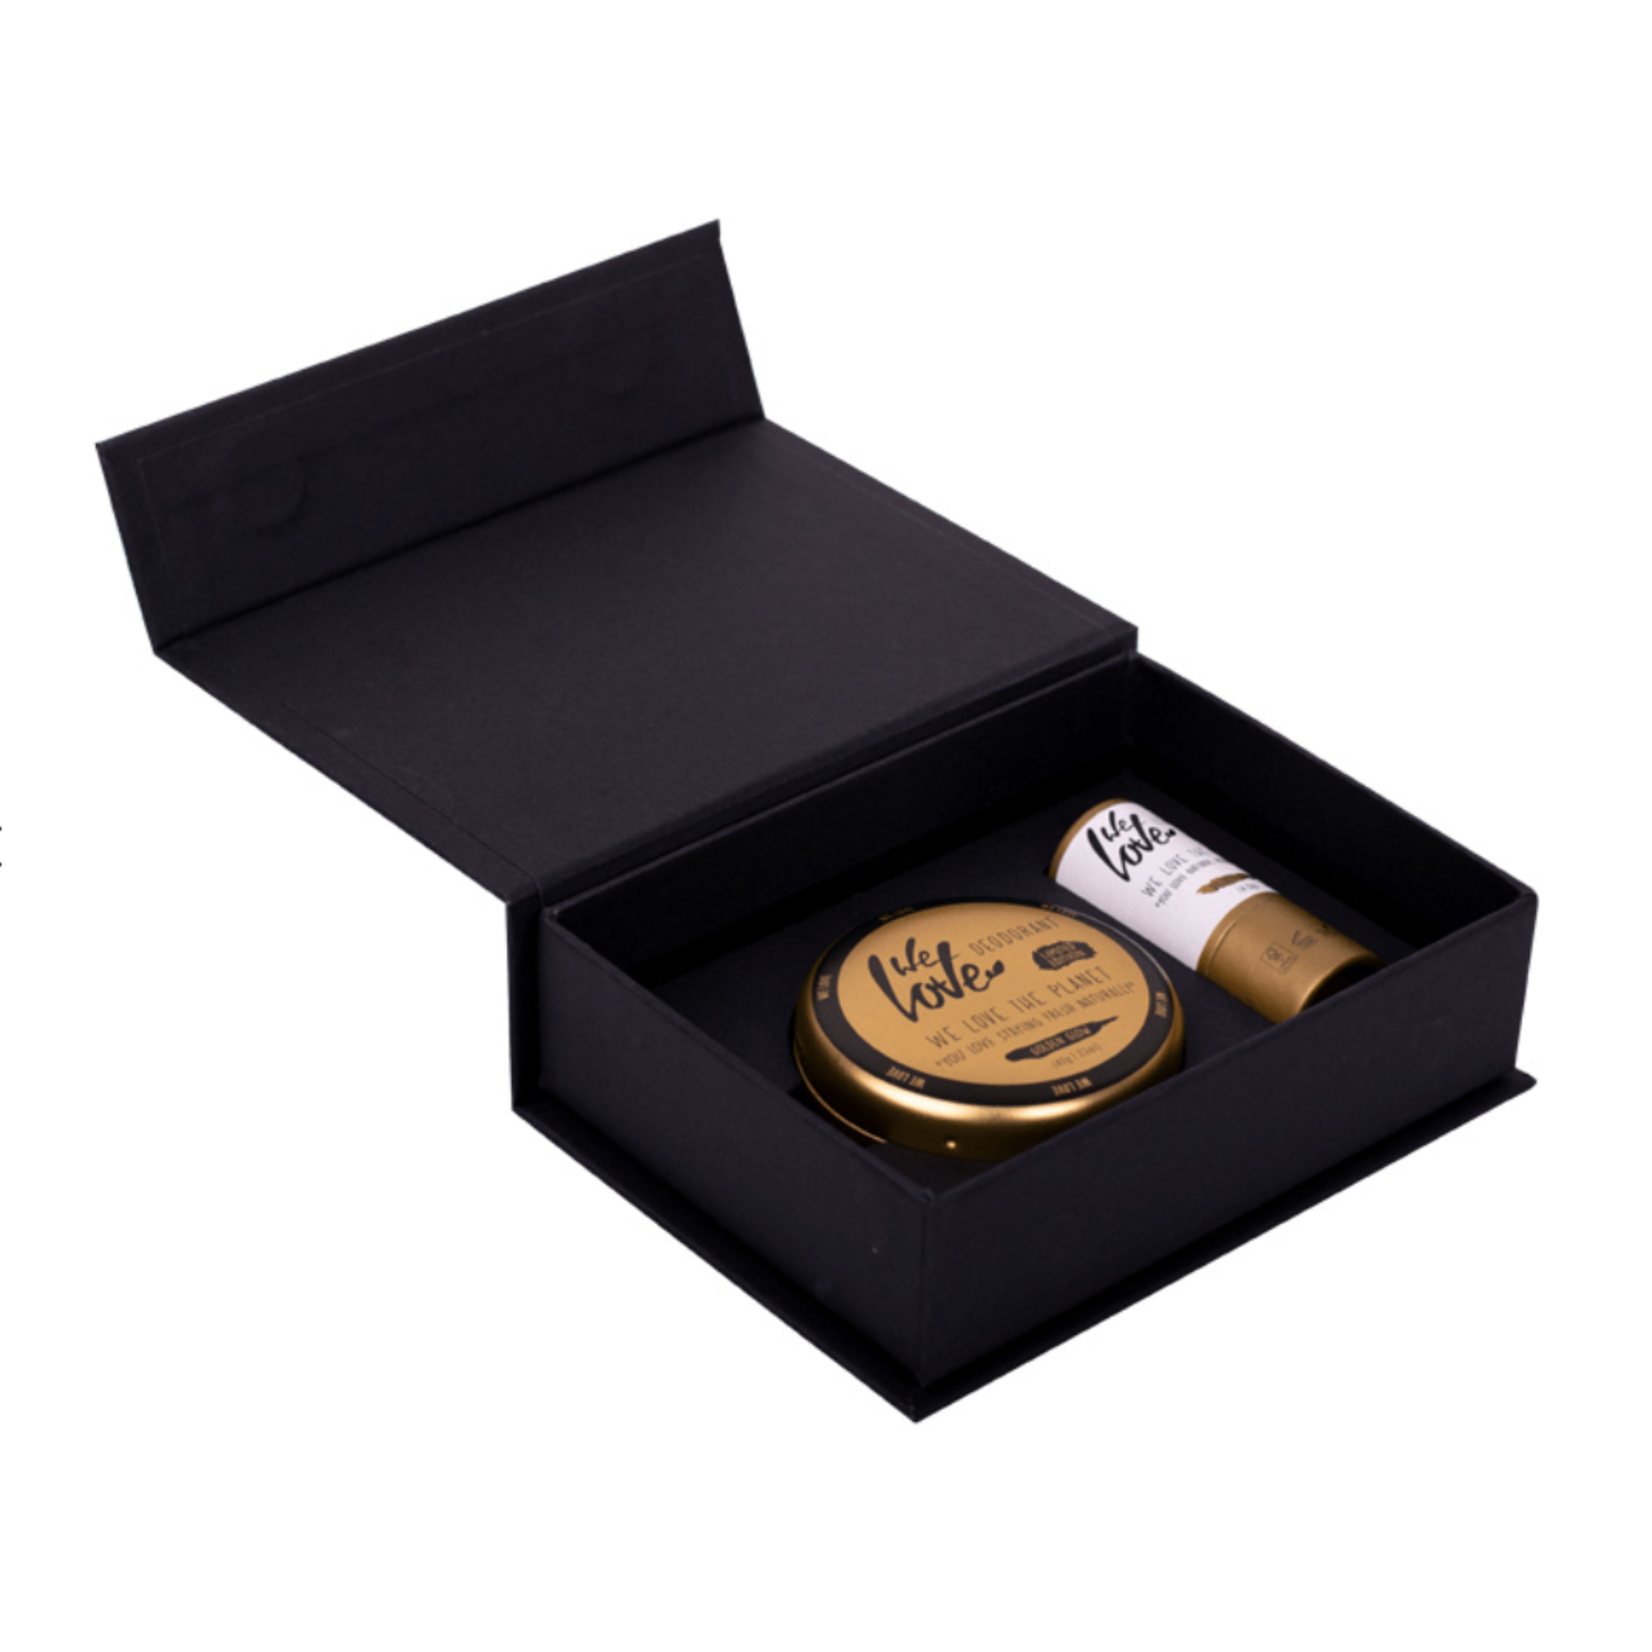 WLTP We Love The Planet - Golden Glow Gift Box - deodorant & lip balm